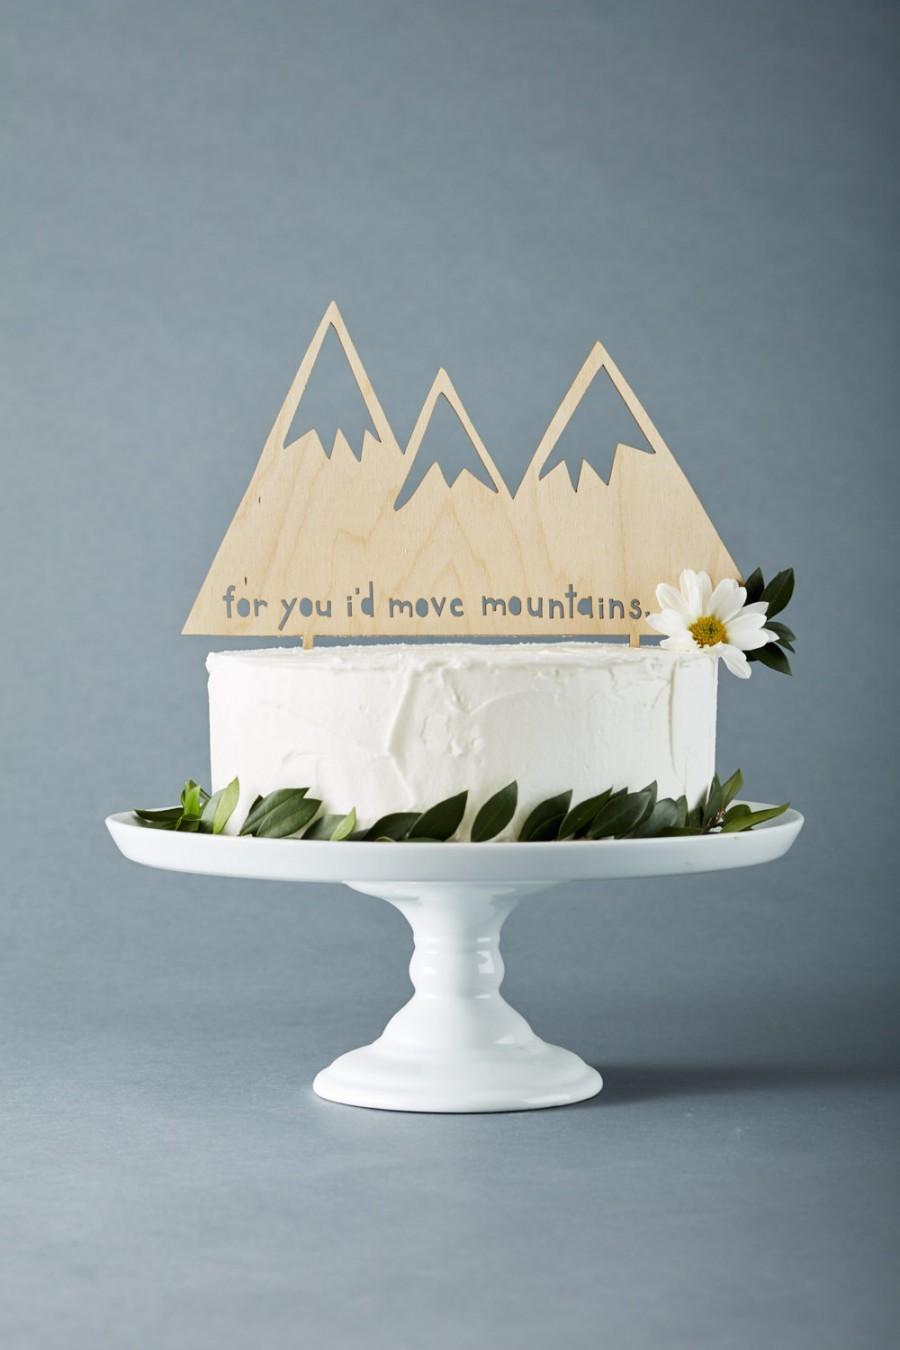 Hochzeit - Custom Wedding Cake Topper - Mountains - Rustic Wooden Wedding Decor - Personalized Wedding Cake Topper - Lasercut Cake Topper